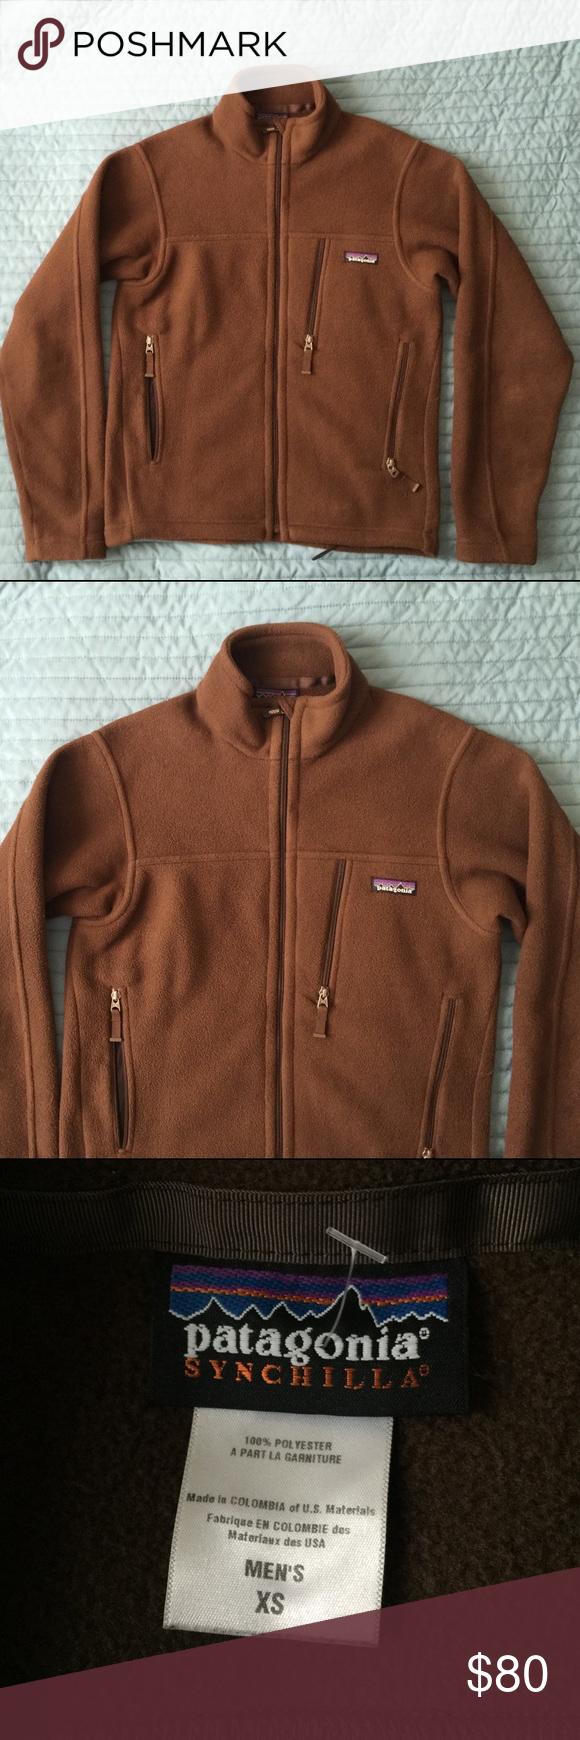 Patagonia synchilla sweater fleece jacket like new fleece sweater